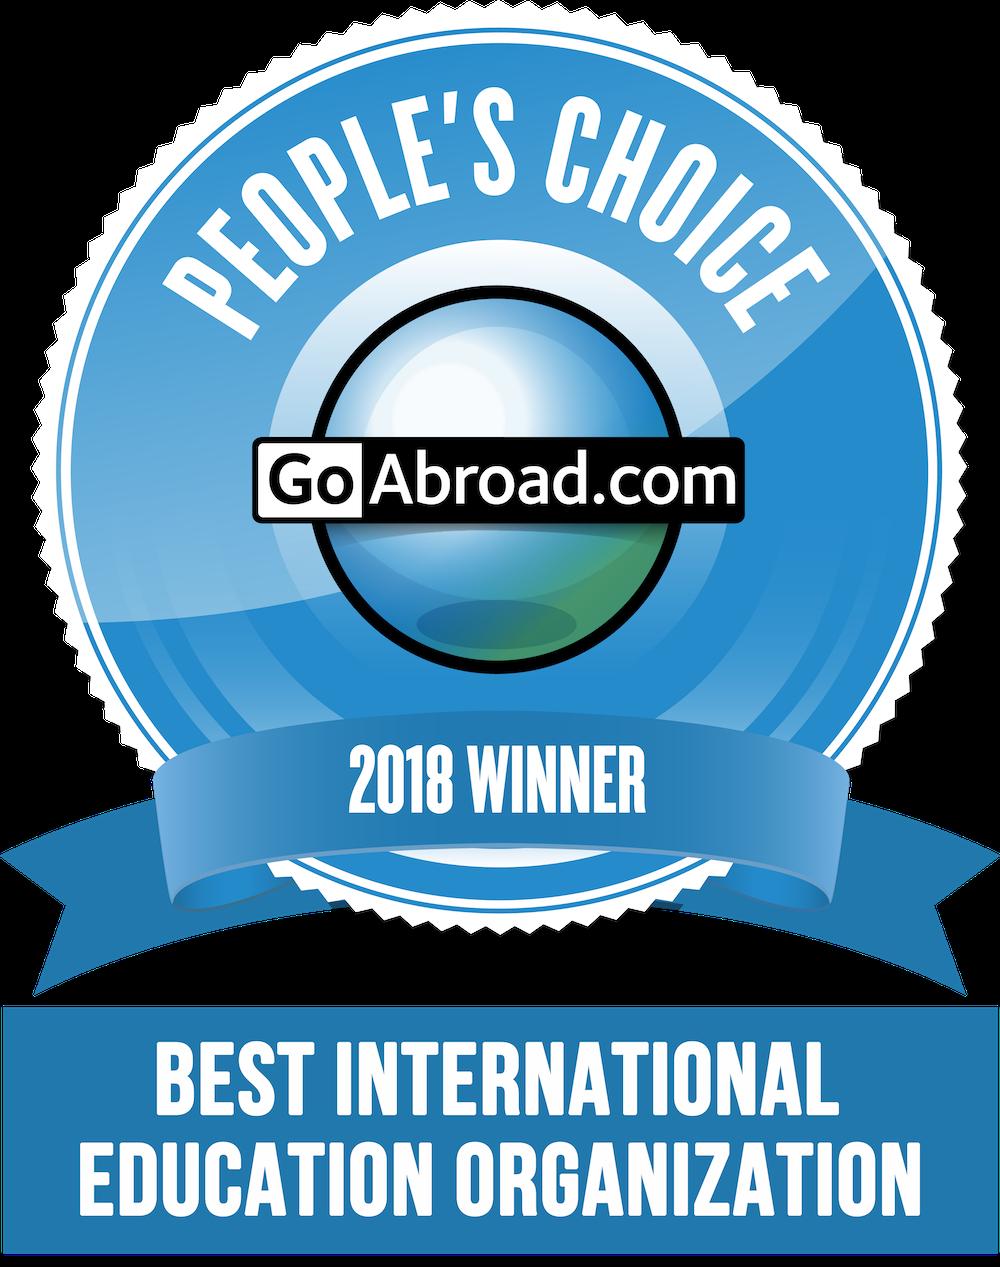 GoAbroad People's Choice Award 2018 Winner for Best International Education Organization